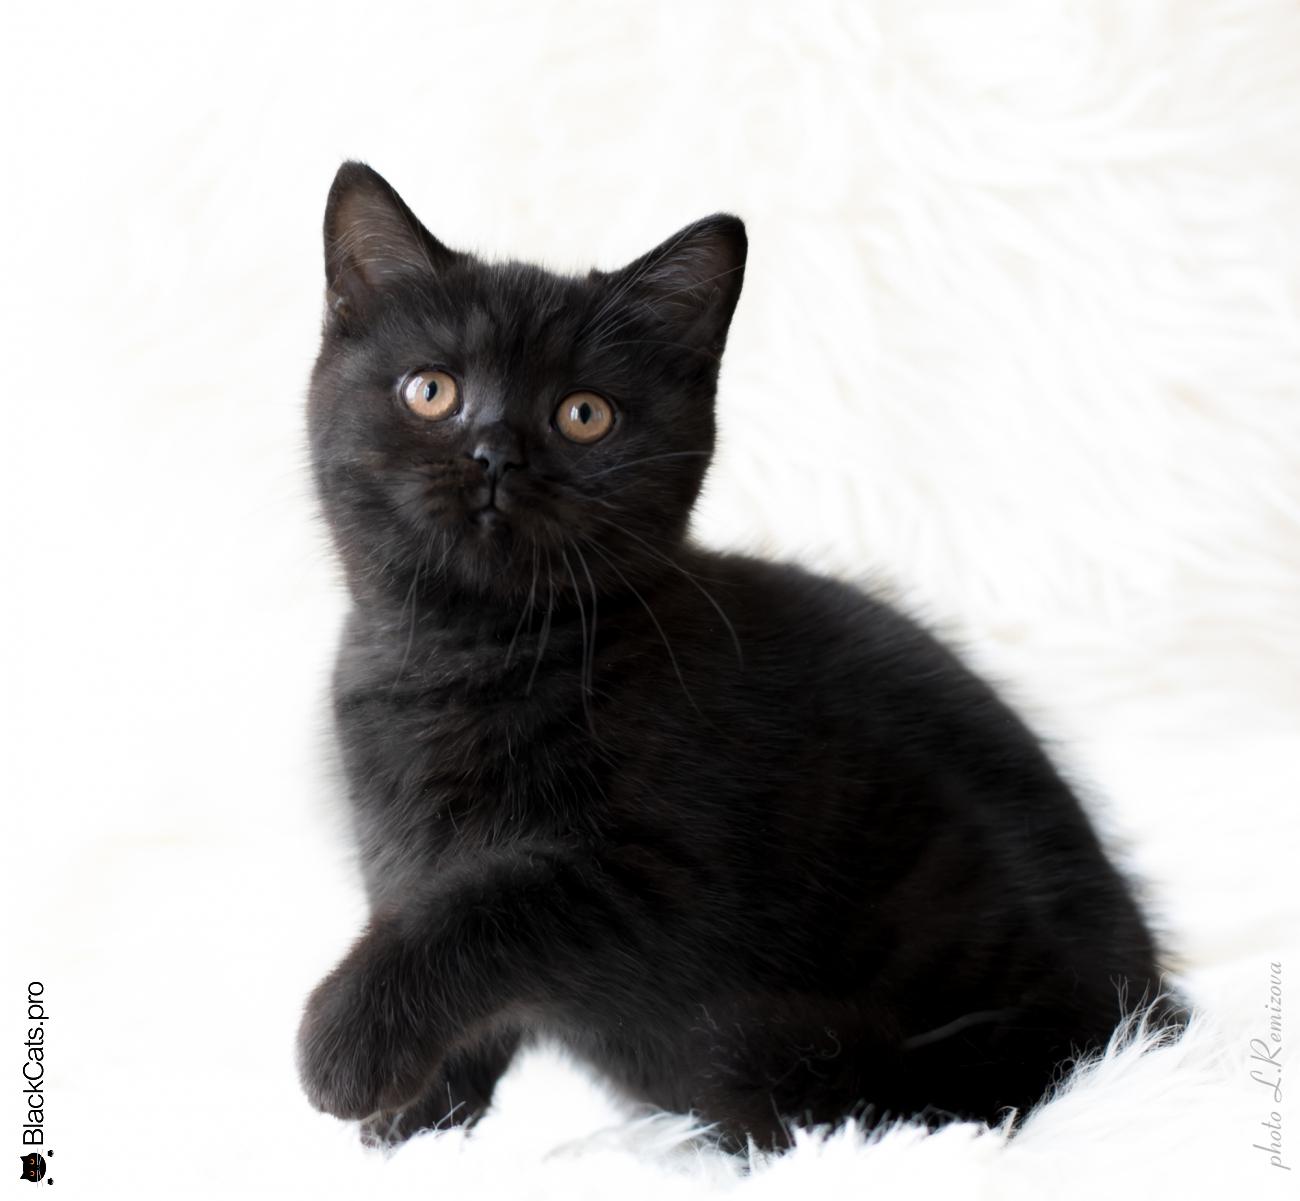 Senorita Ornella Black Jetstone 3 months